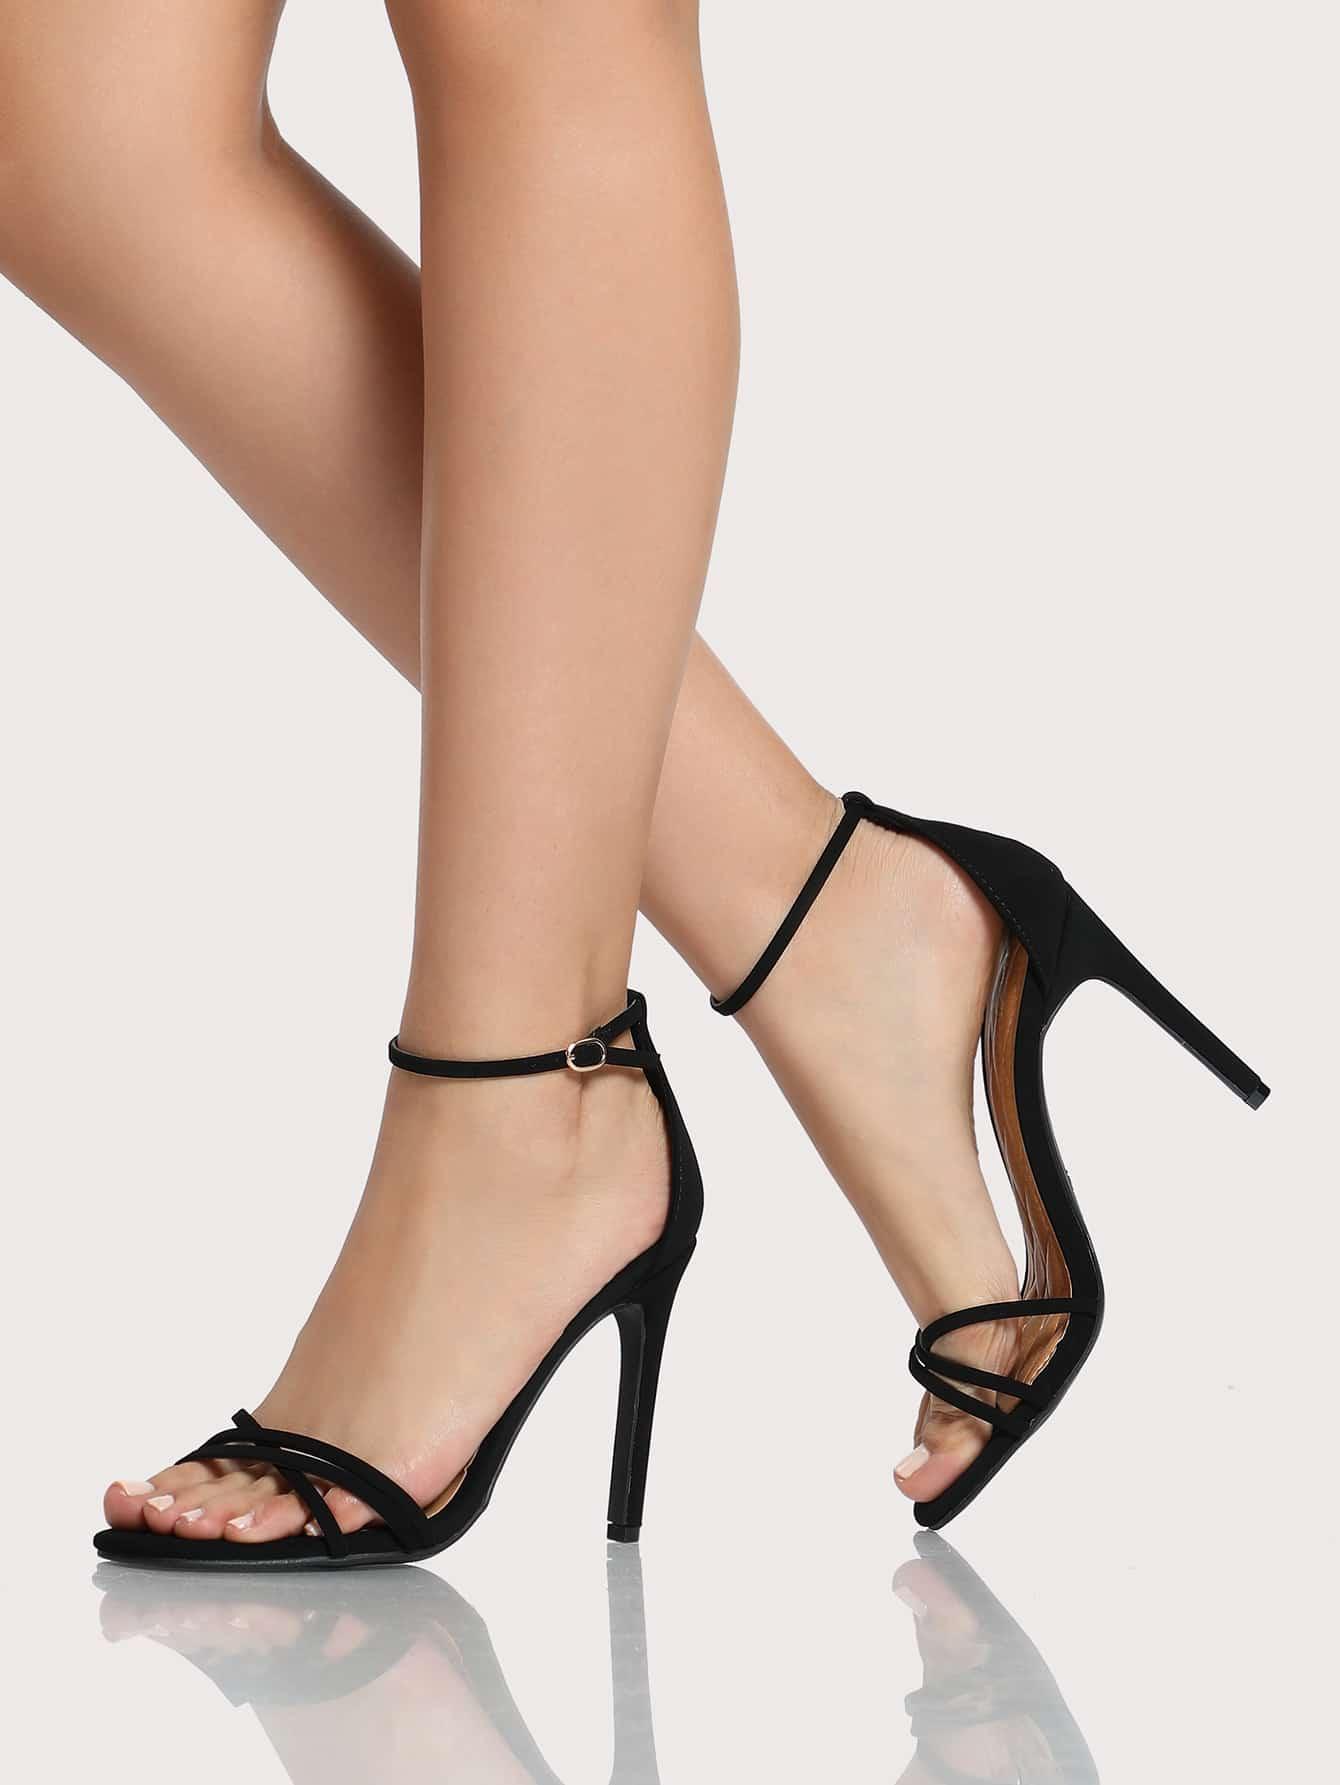 Strappy Ankle Strap Sandal Heels BLACK -SheIn(Sheinside)